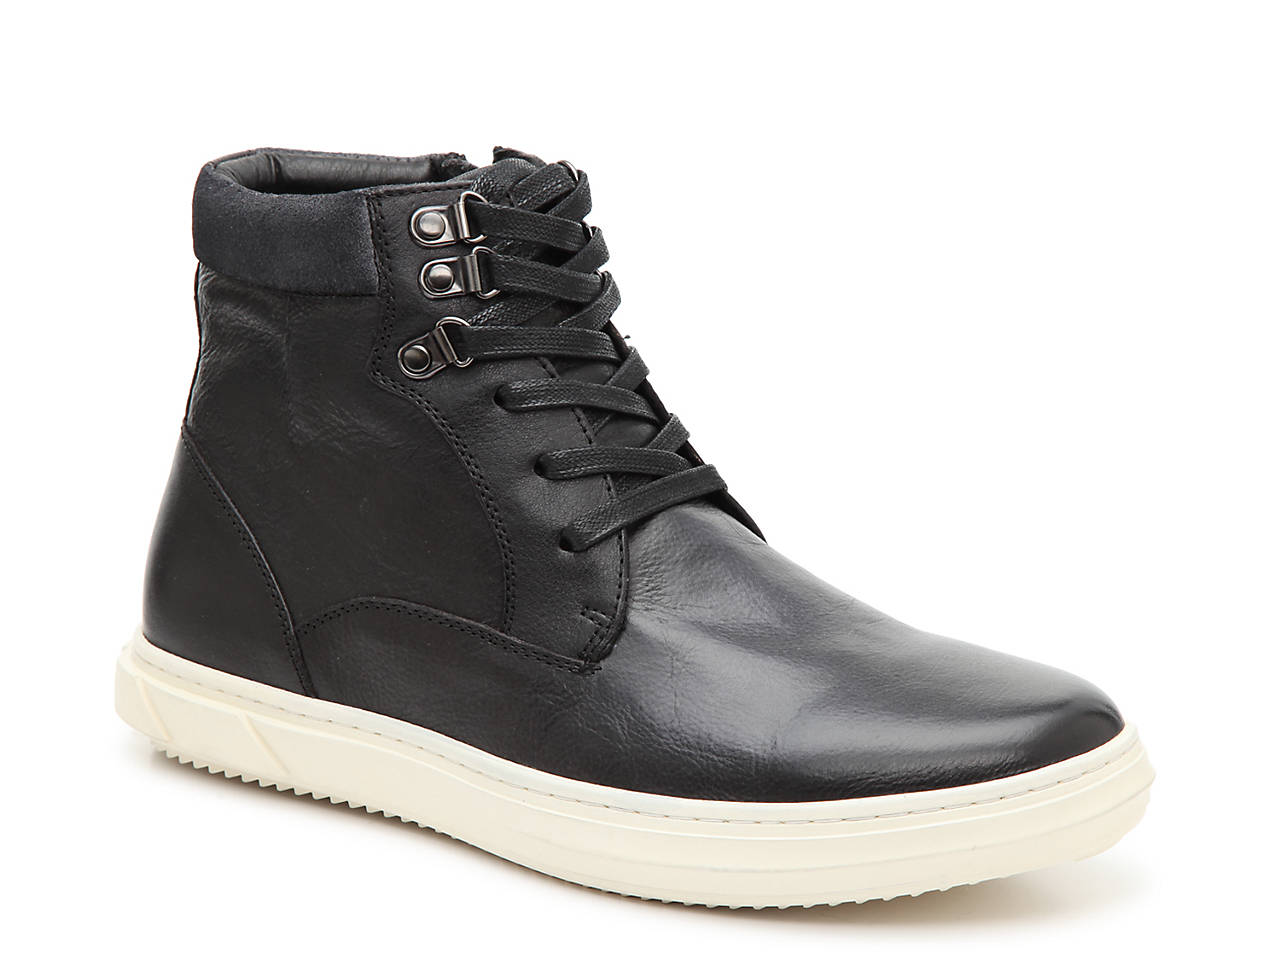 Shadowworth High Shadowworth Top Shadowworth Top Sneaker High Sneaker High Top eEYbW9HID2